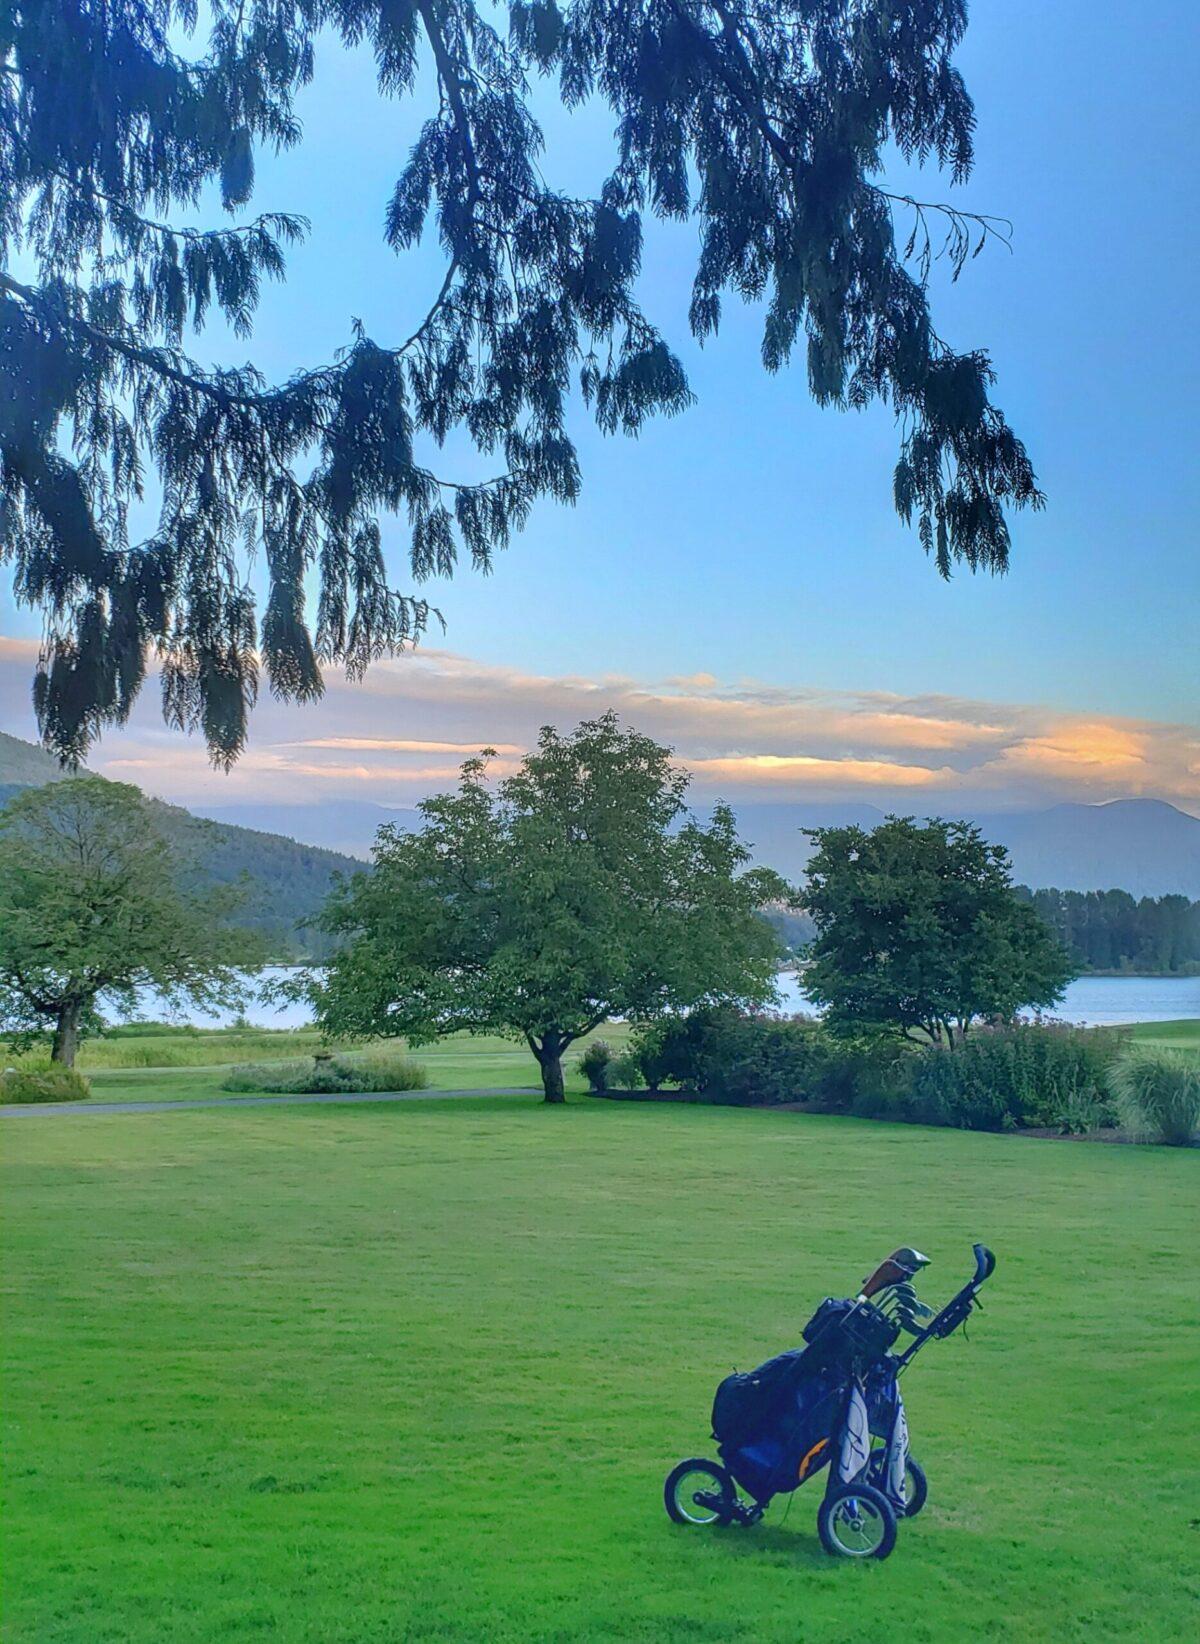 Sandpiper Inn Golf Course with golf bag